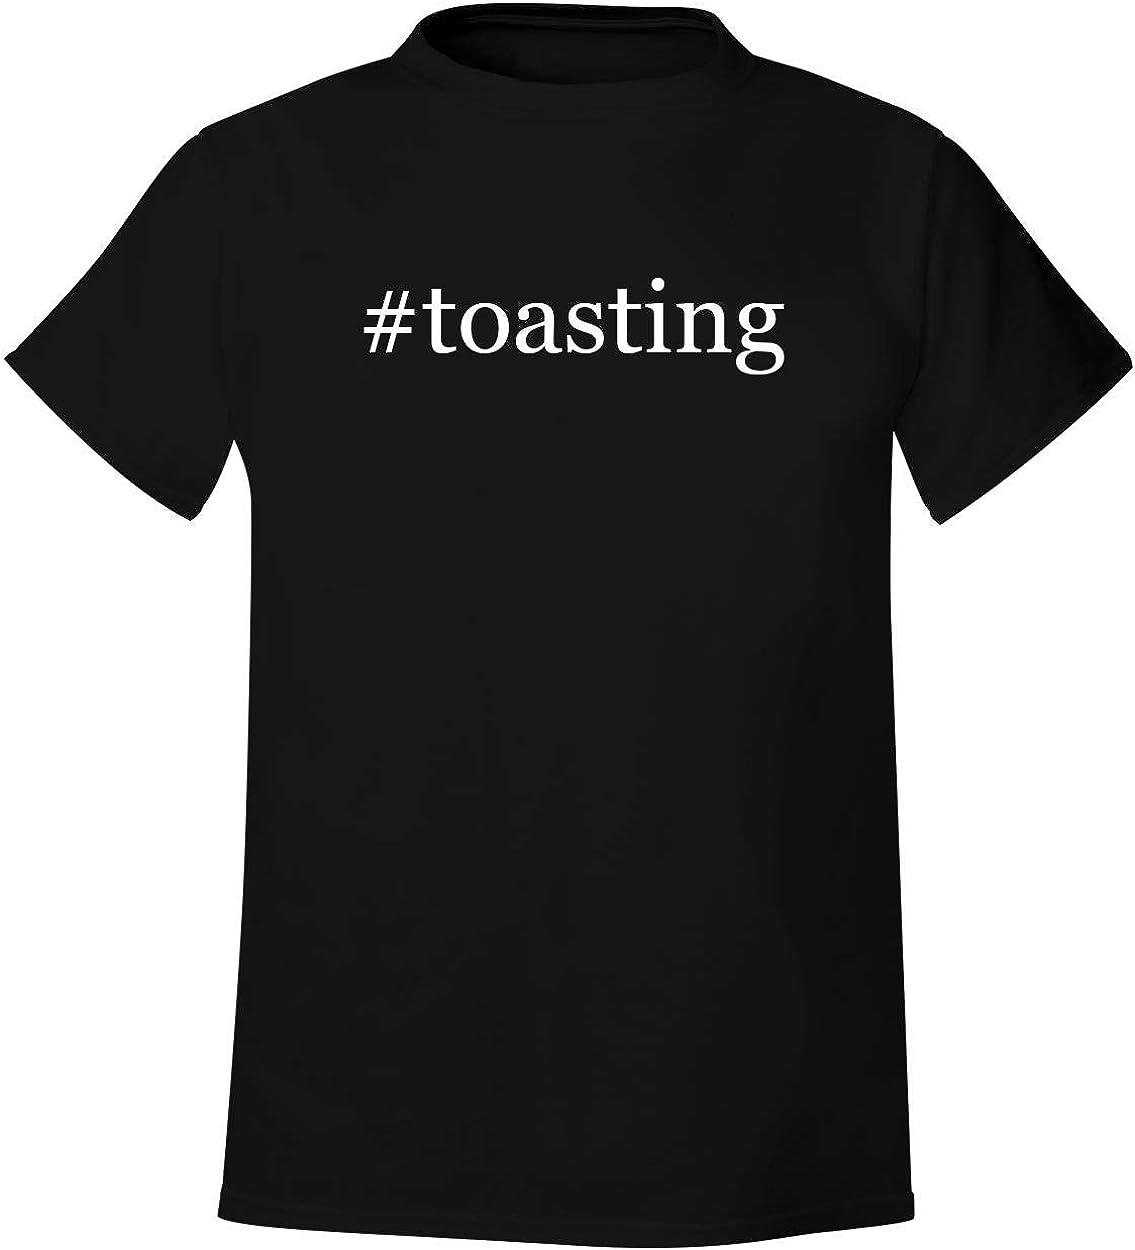 #toasting - Men's Hashtag Soft & Comfortable T-Shirt